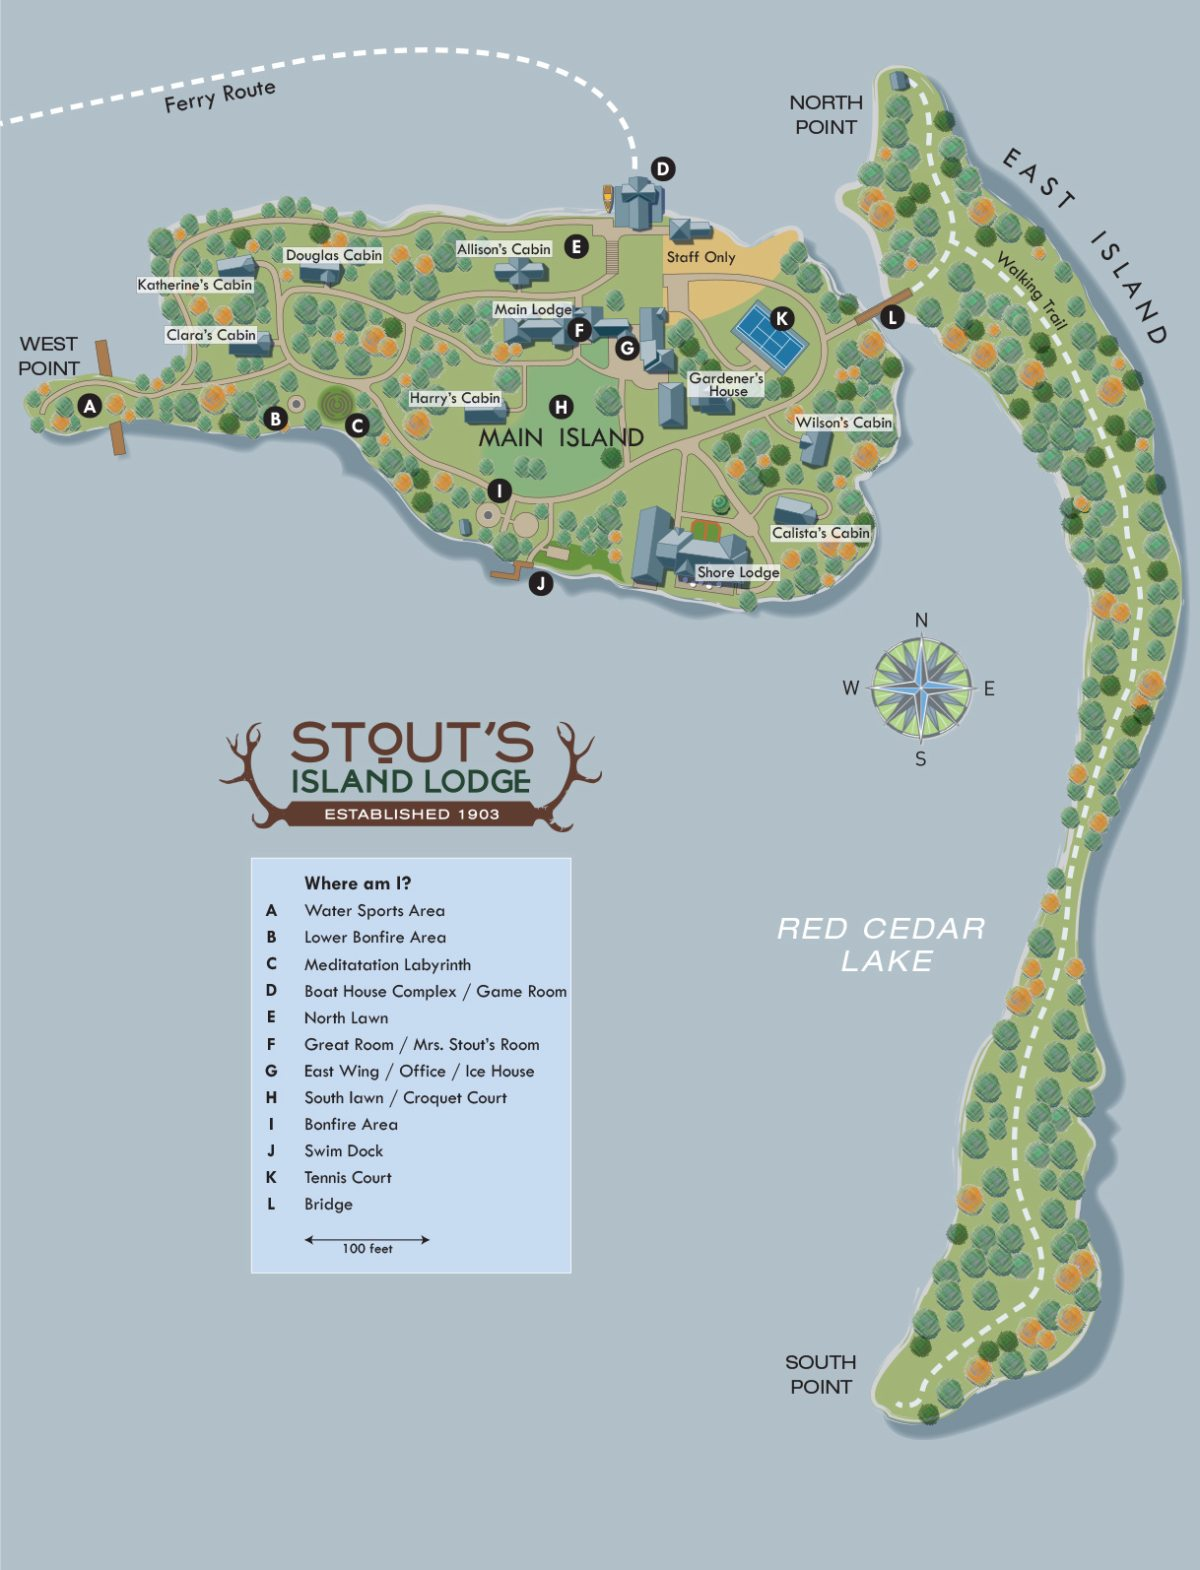 Stout's island map